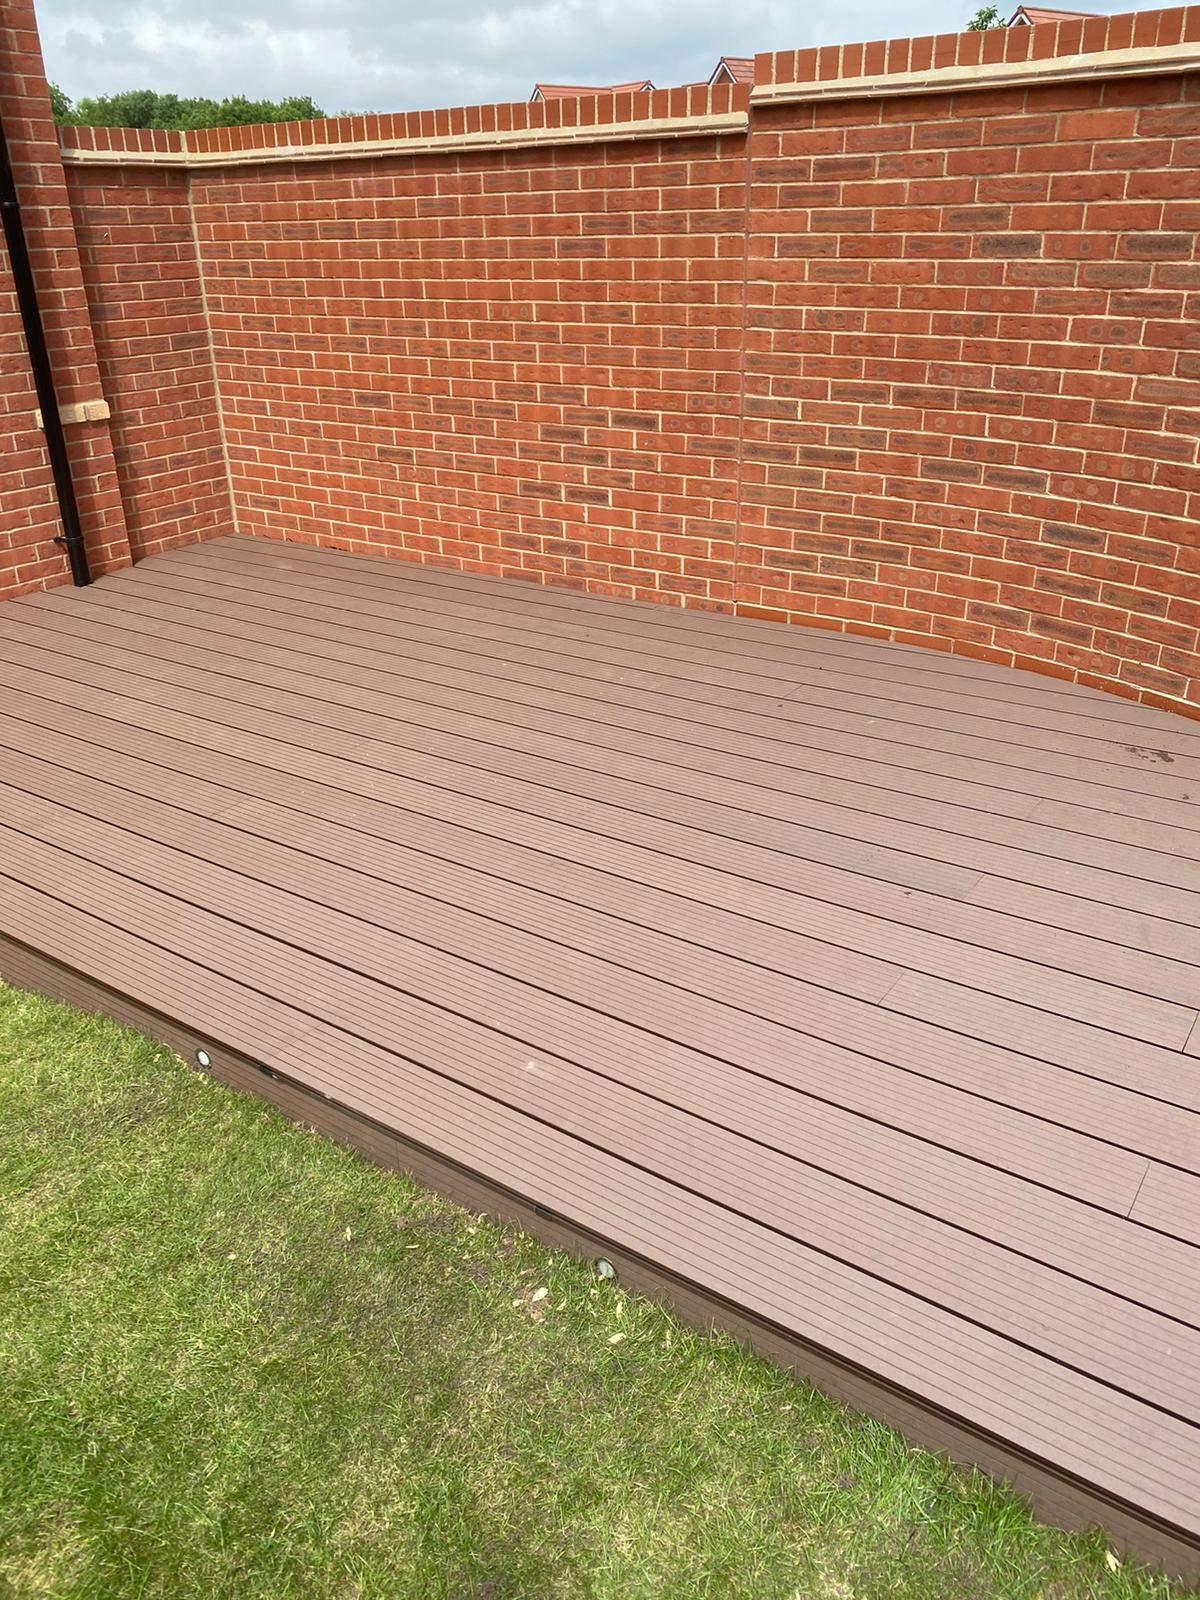 Composite Decking installed in Peterborough